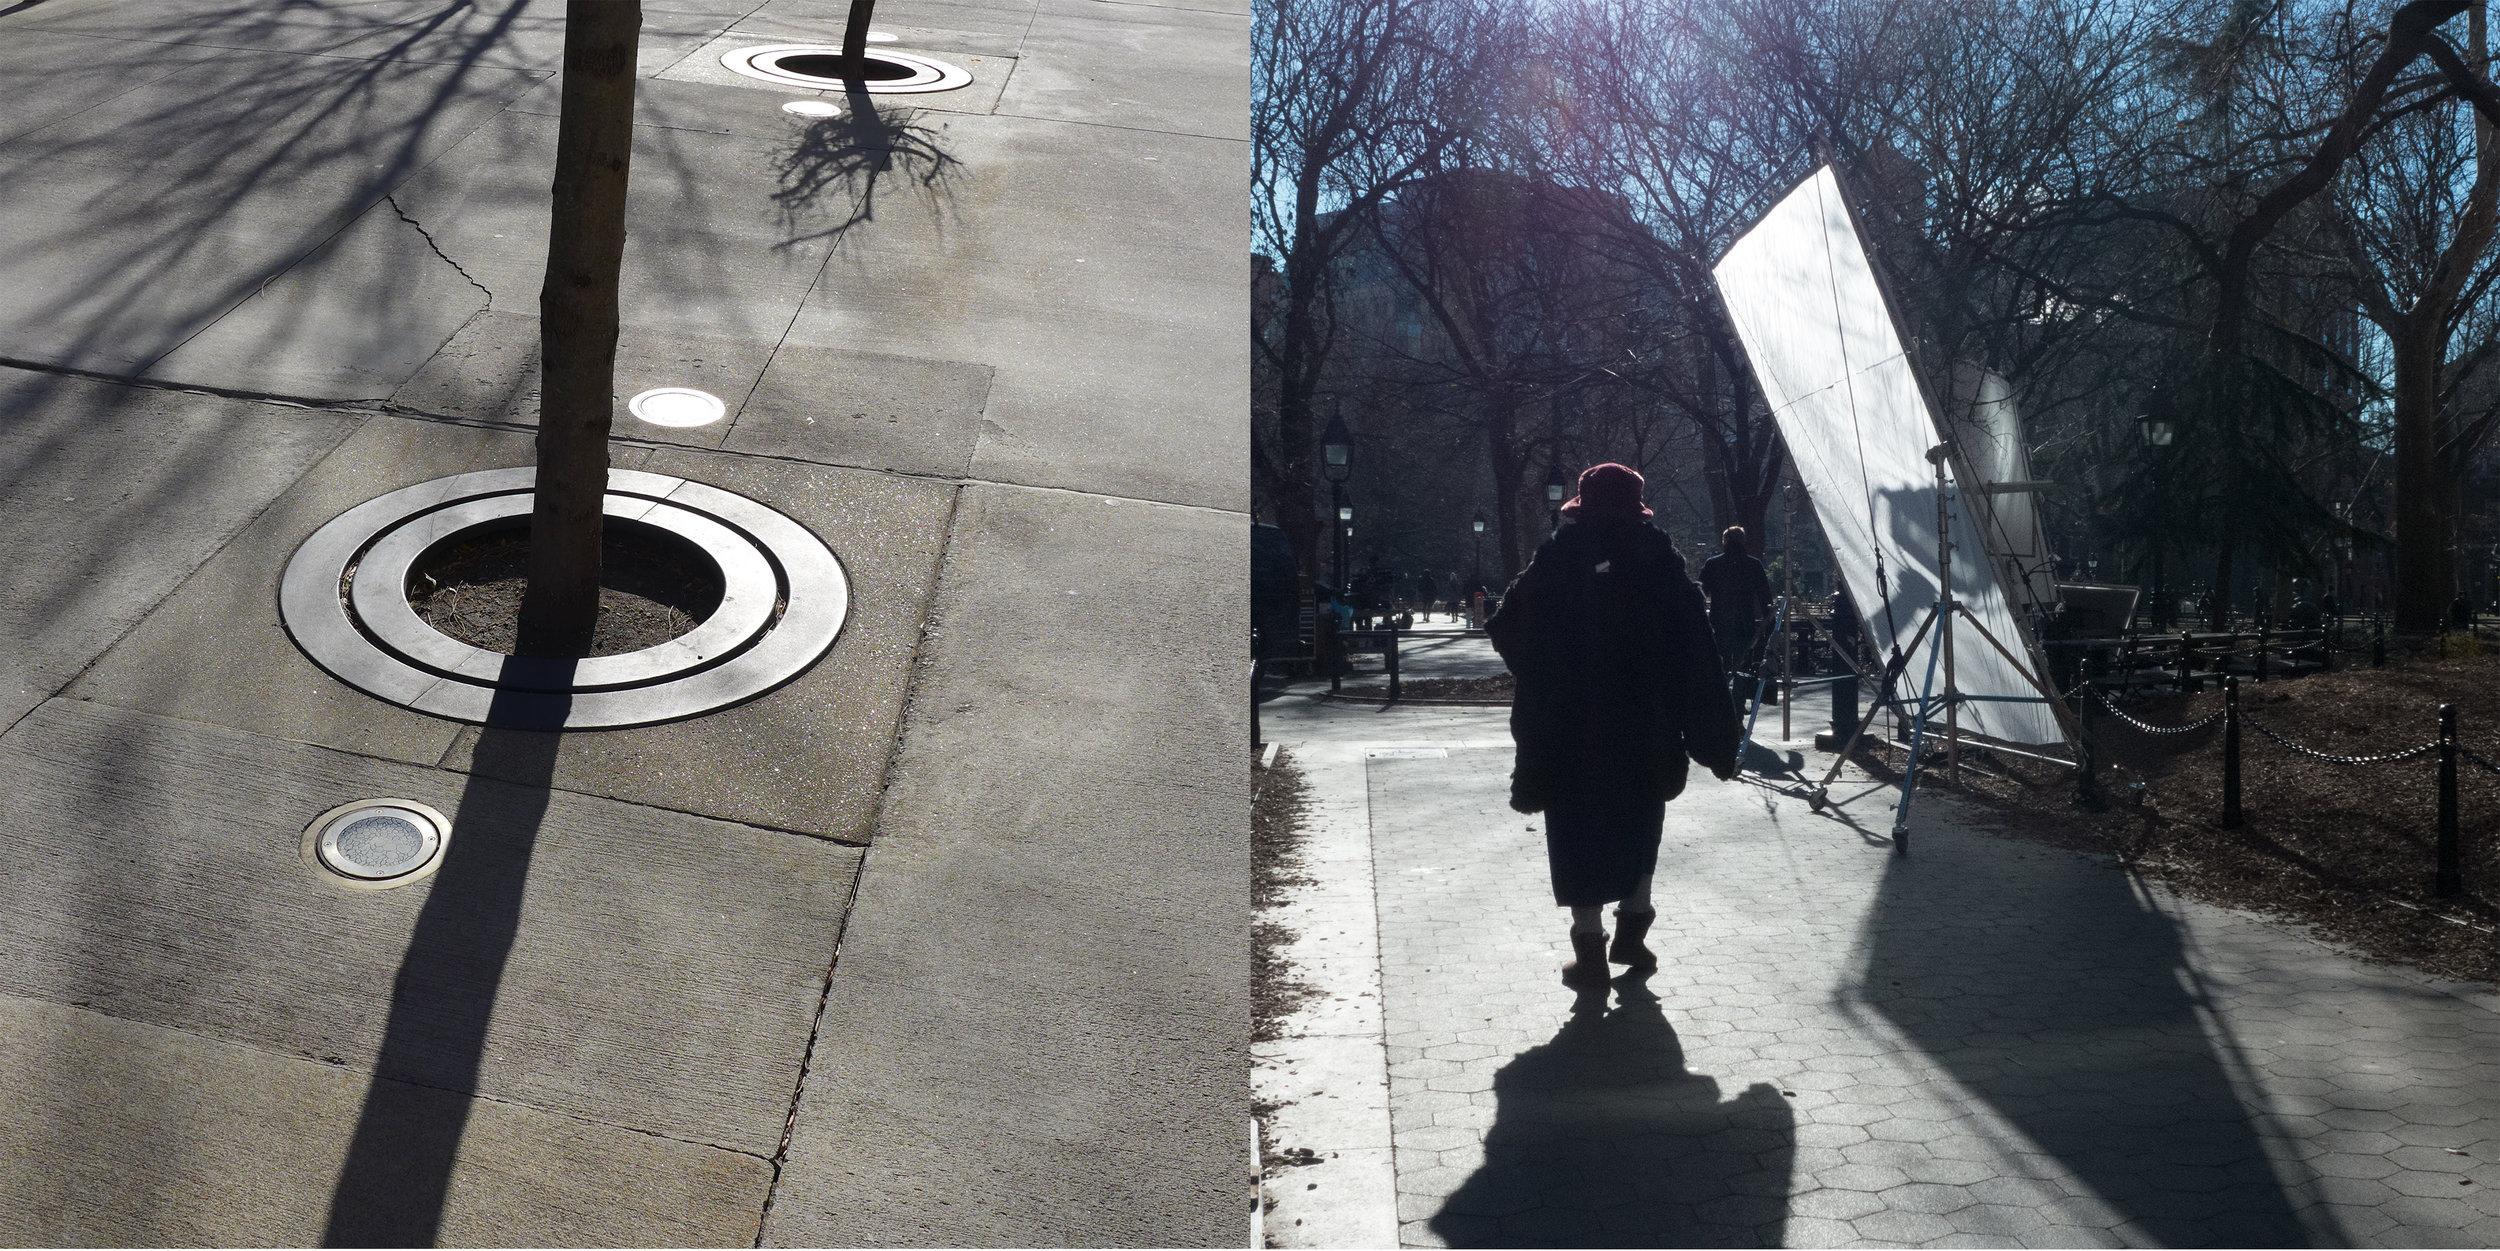 Light, Lincoln Center & Scrim, Washington Square Park